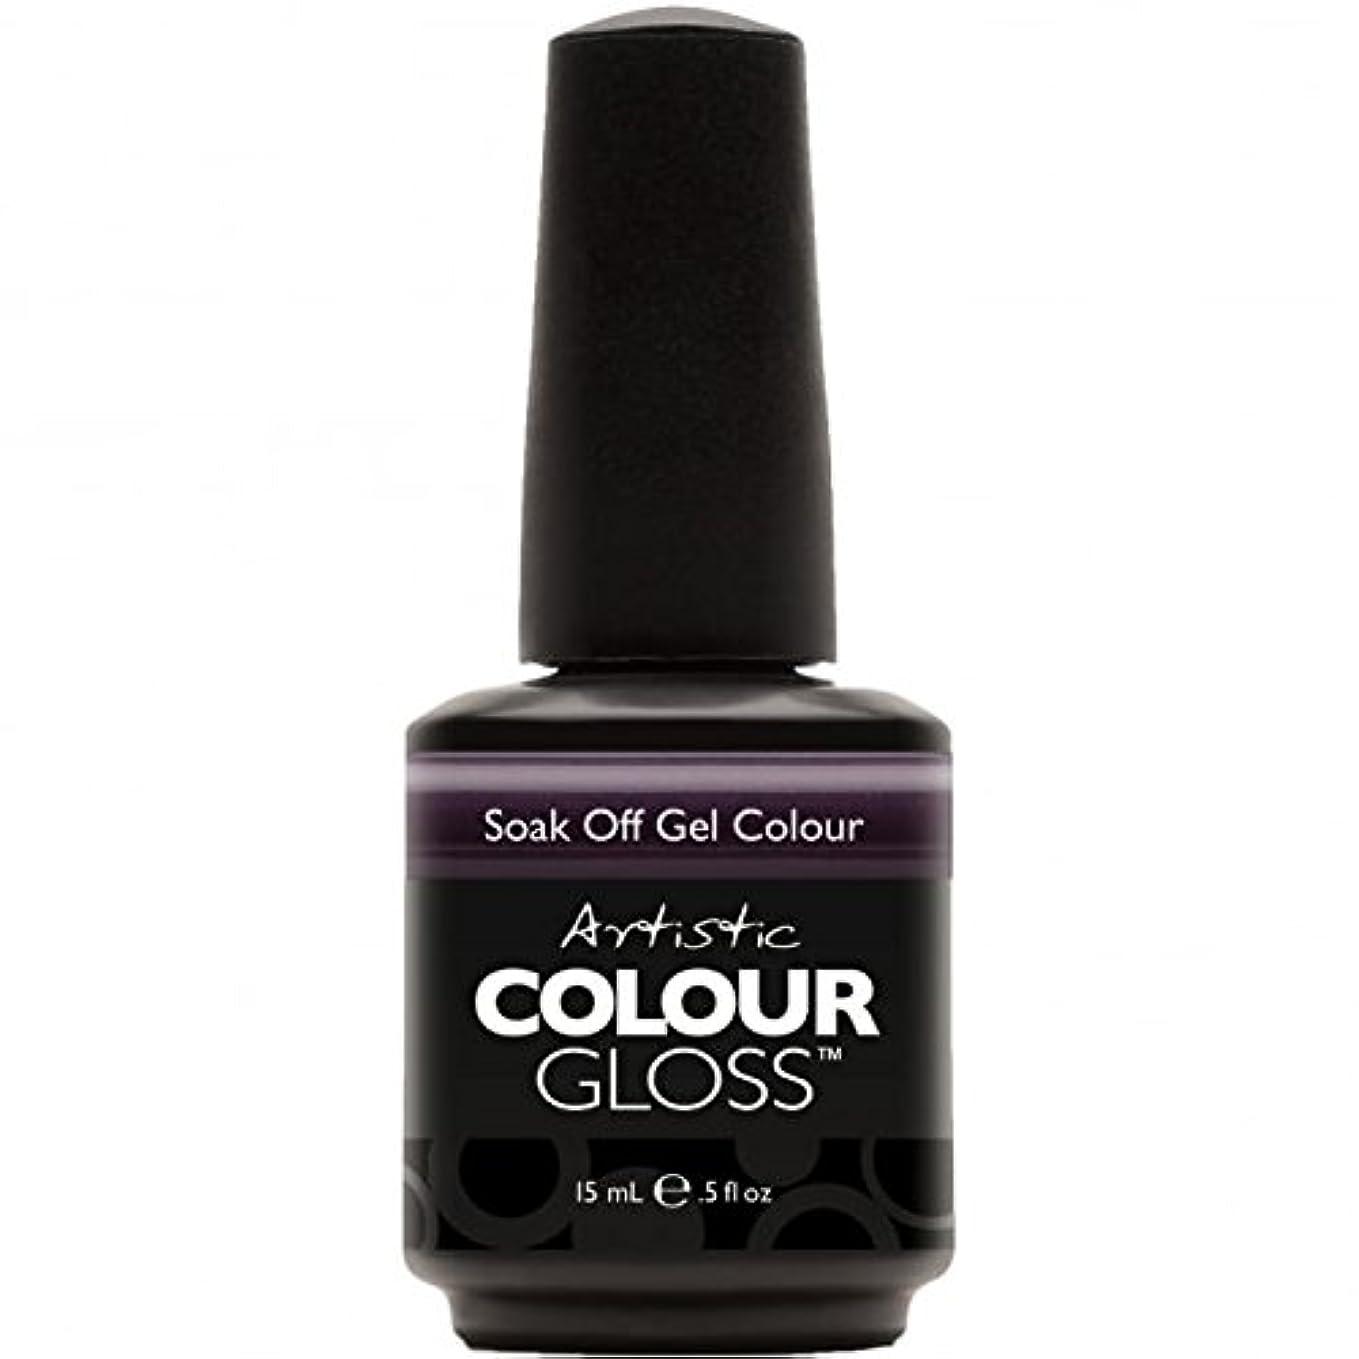 牽引公爵夫人箱Artistic Colour Gloss - Royalty - 0.5oz / 15ml